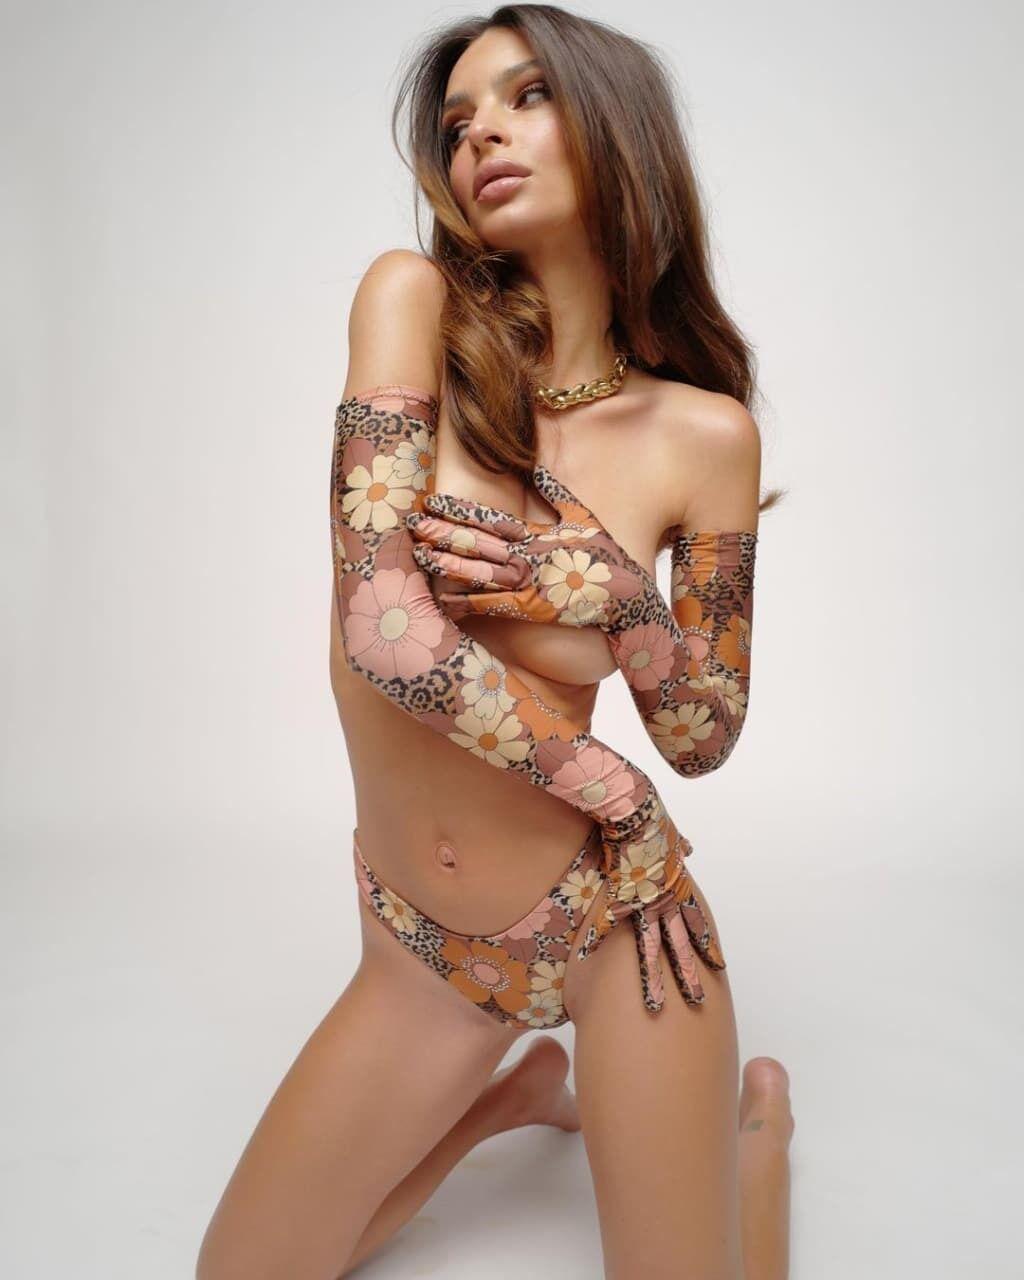 Эмили Ратаковски показала фигуру.